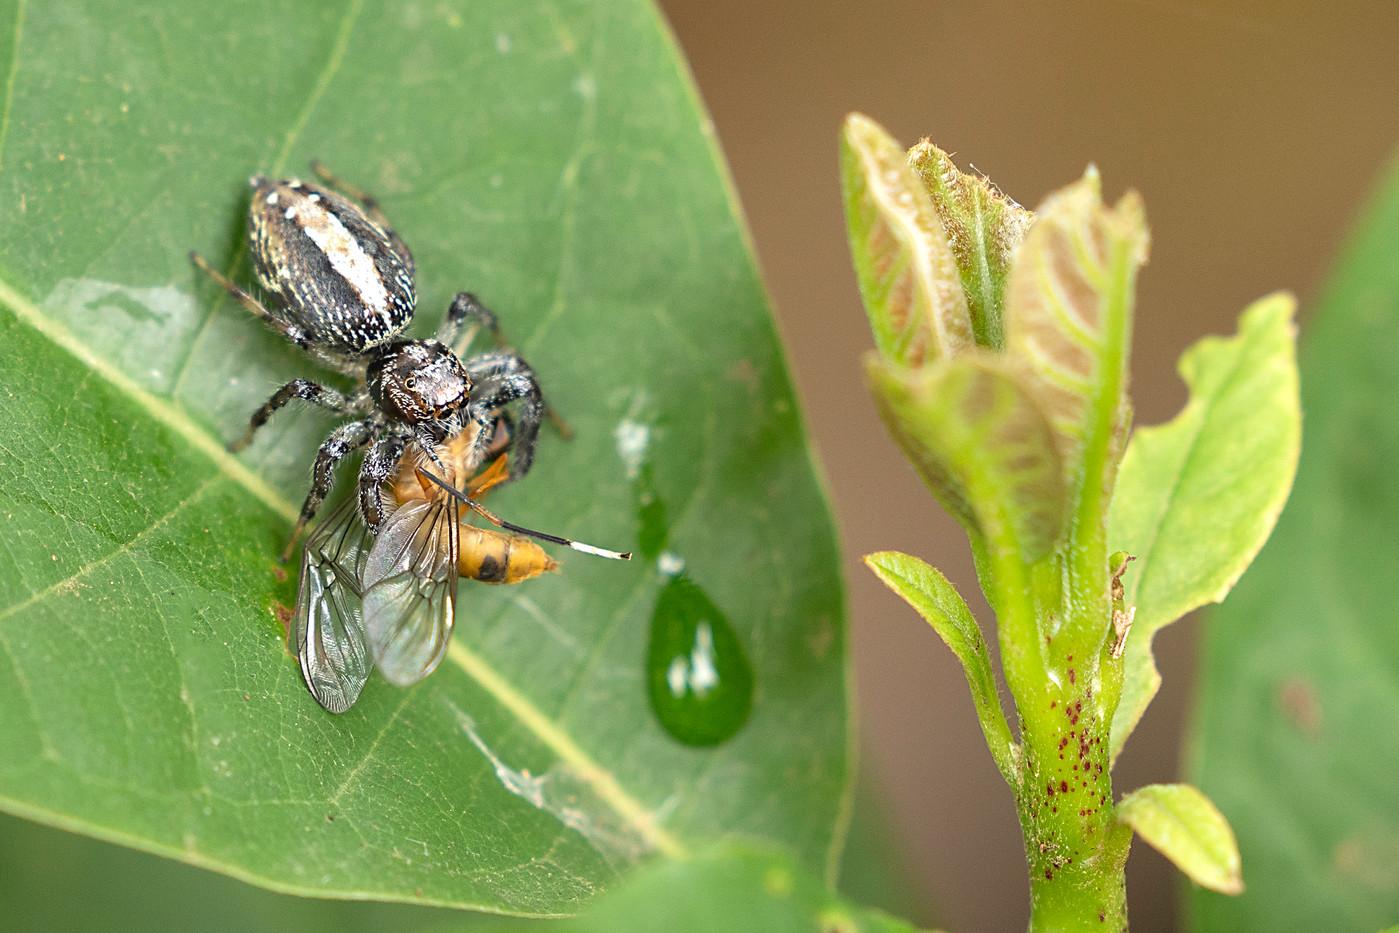 Jumping Spider & prey in Arusha, Tanzania